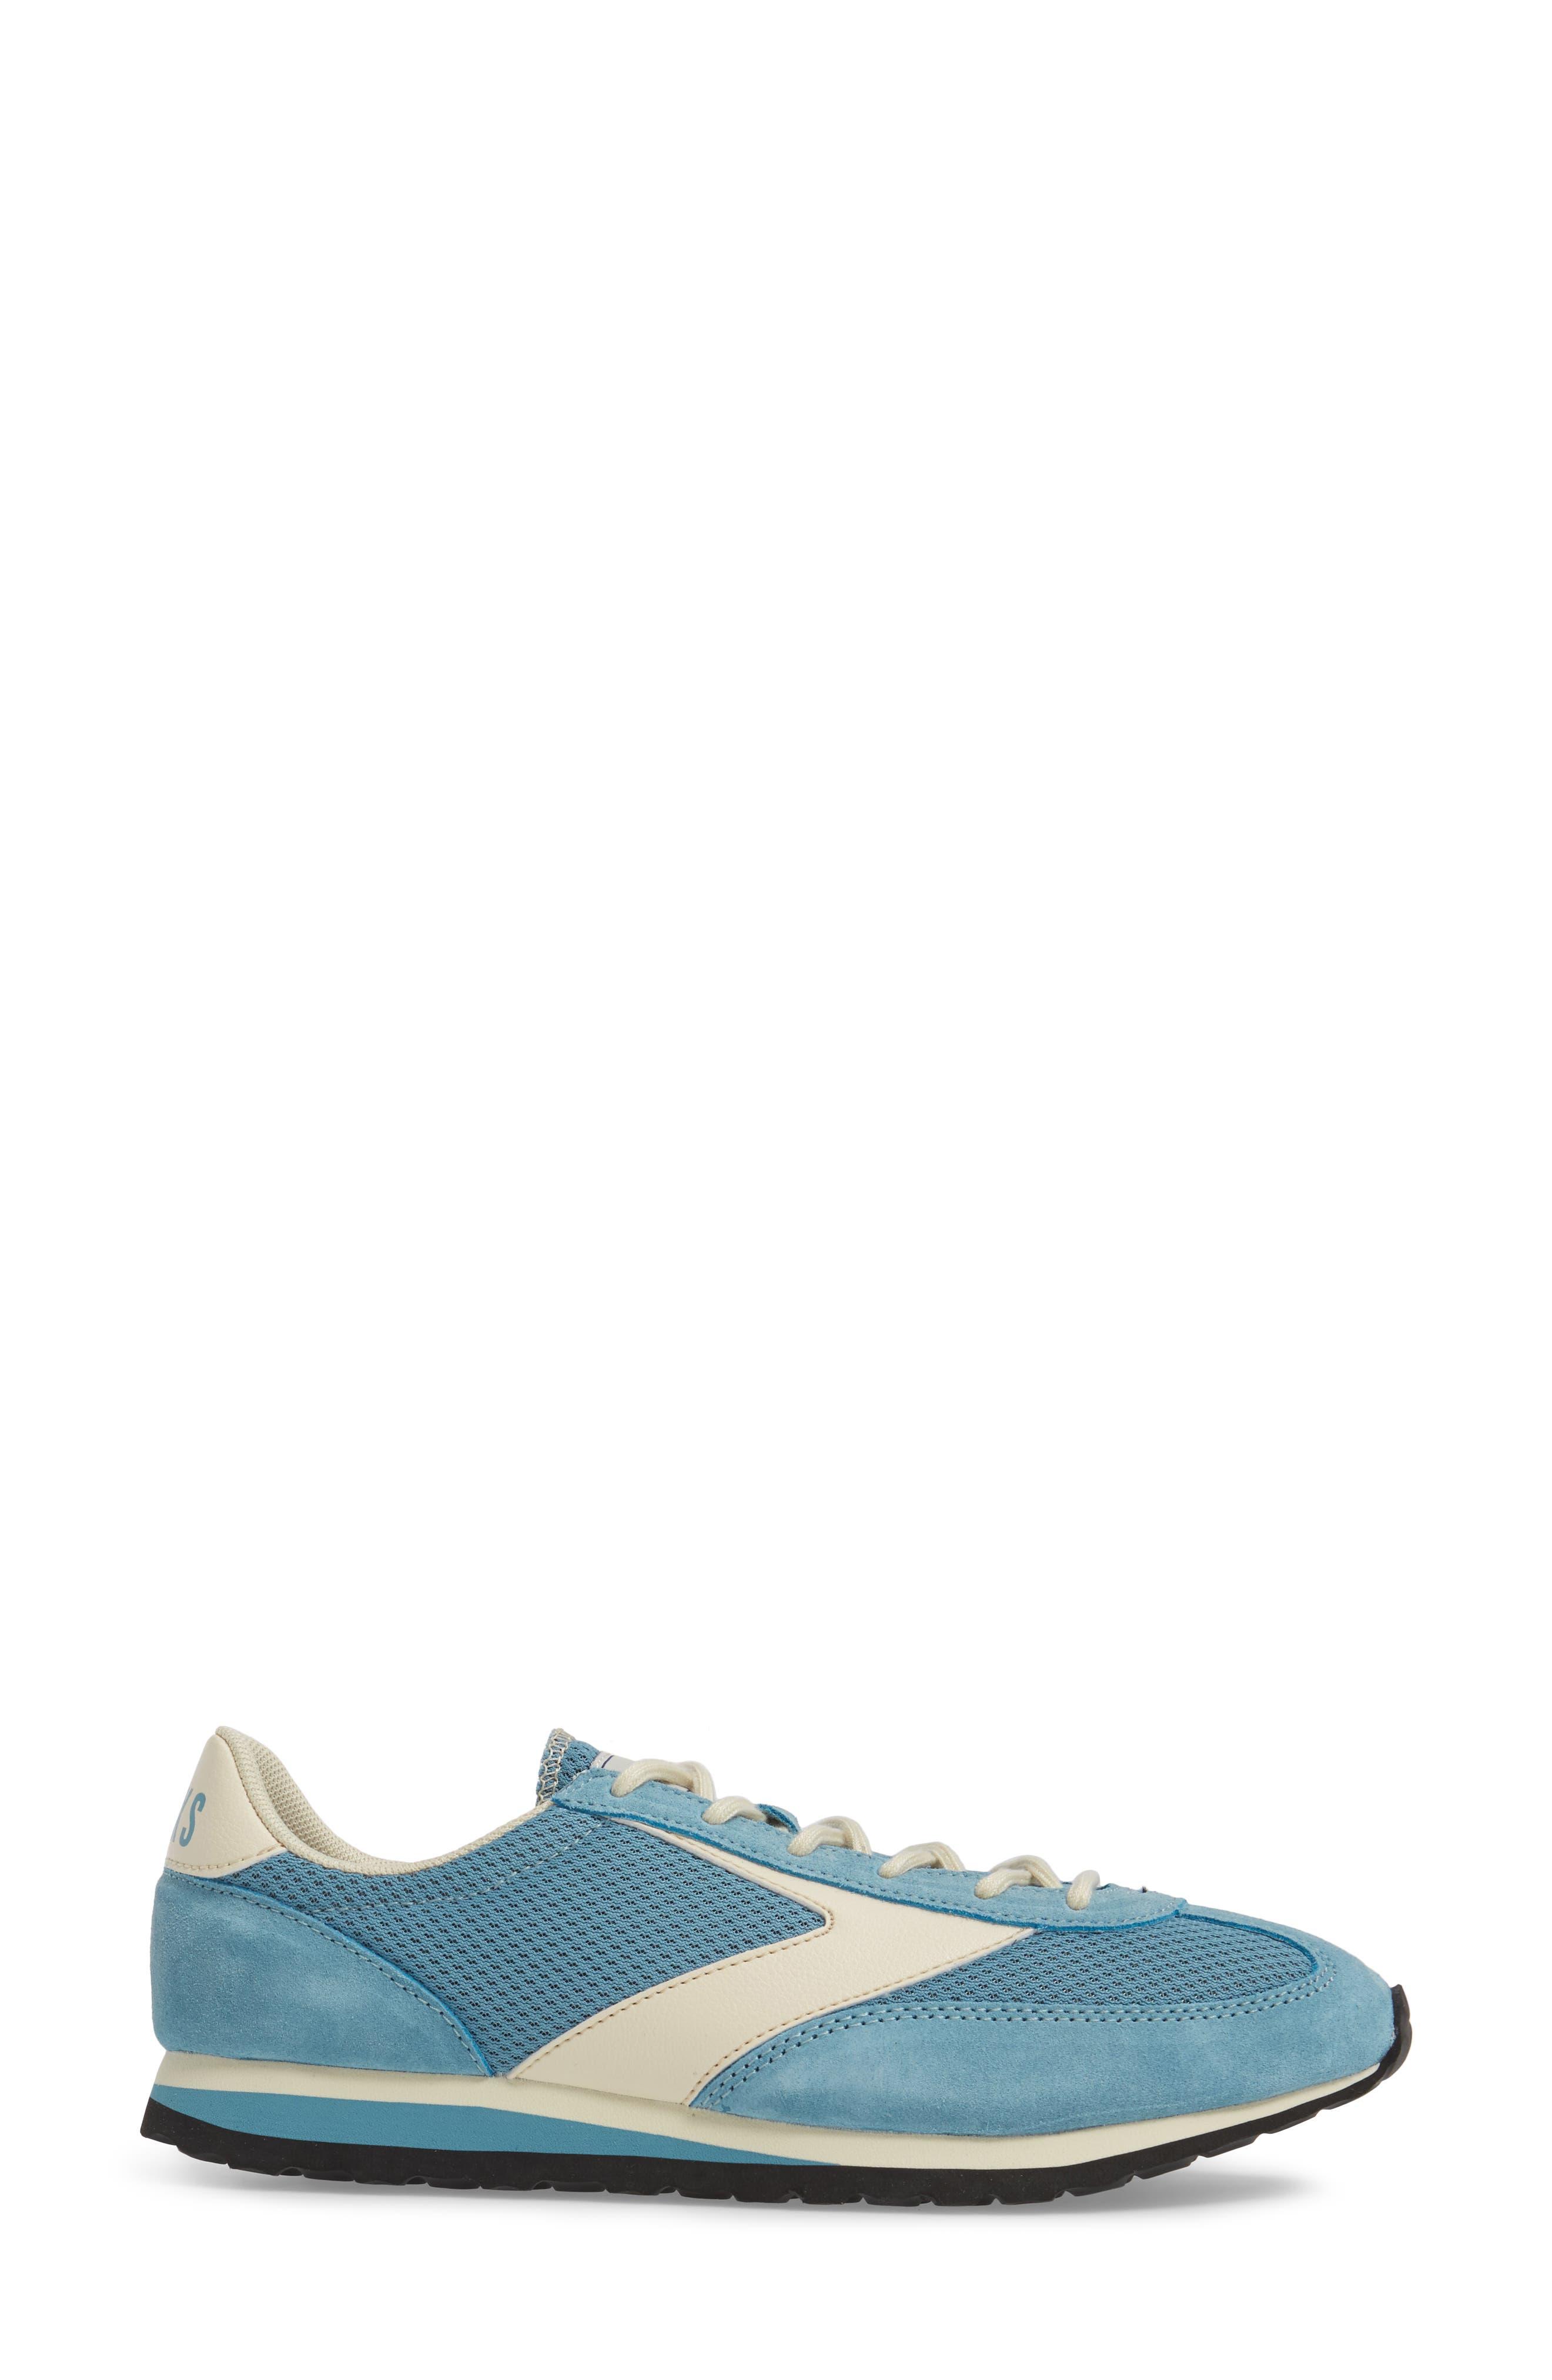 'Vanguard' Sneaker,                             Alternate thumbnail 124, color,